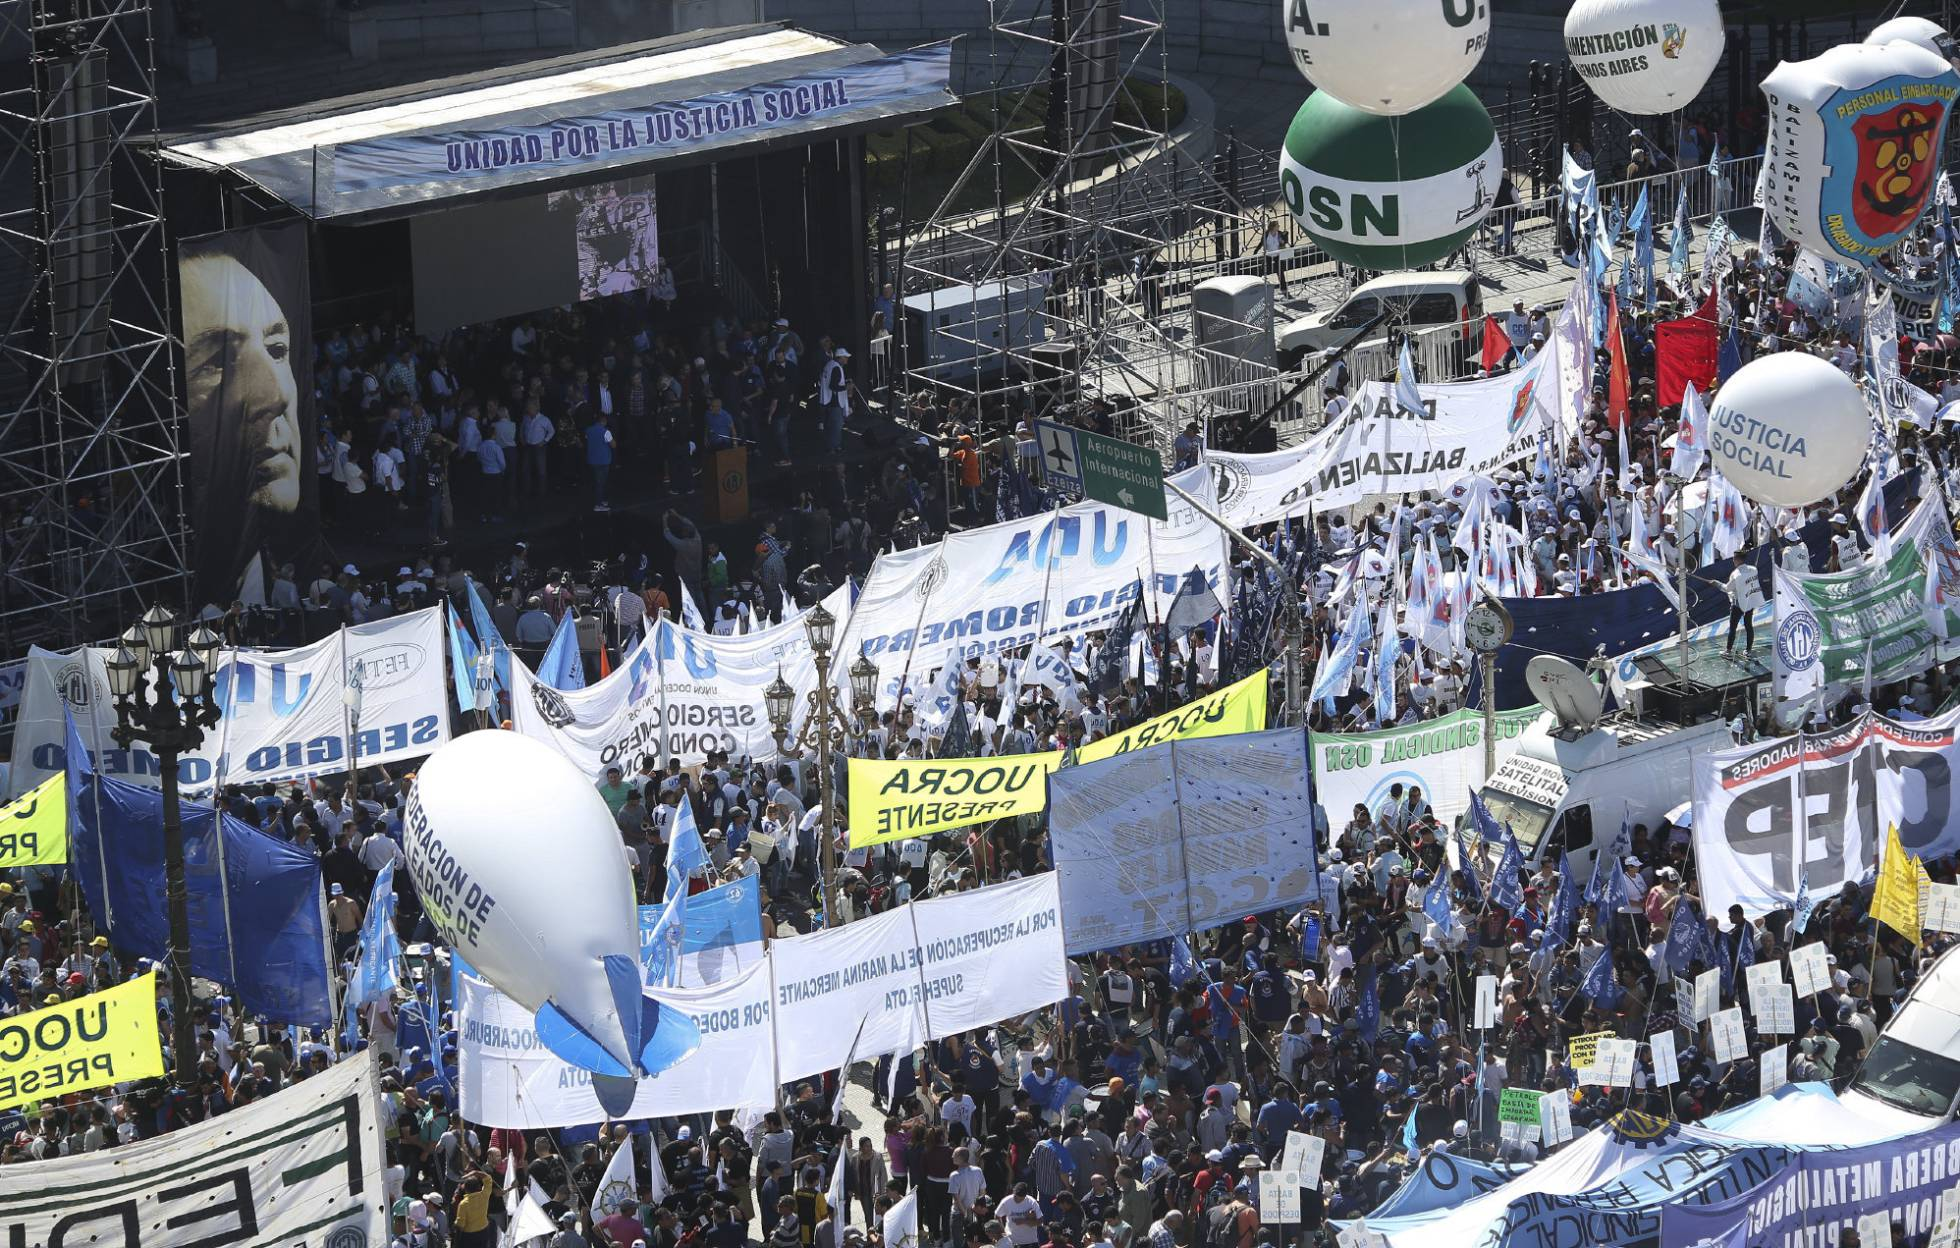 Sindicatos argentinos anunciam a primeira greve nacional contra Macri